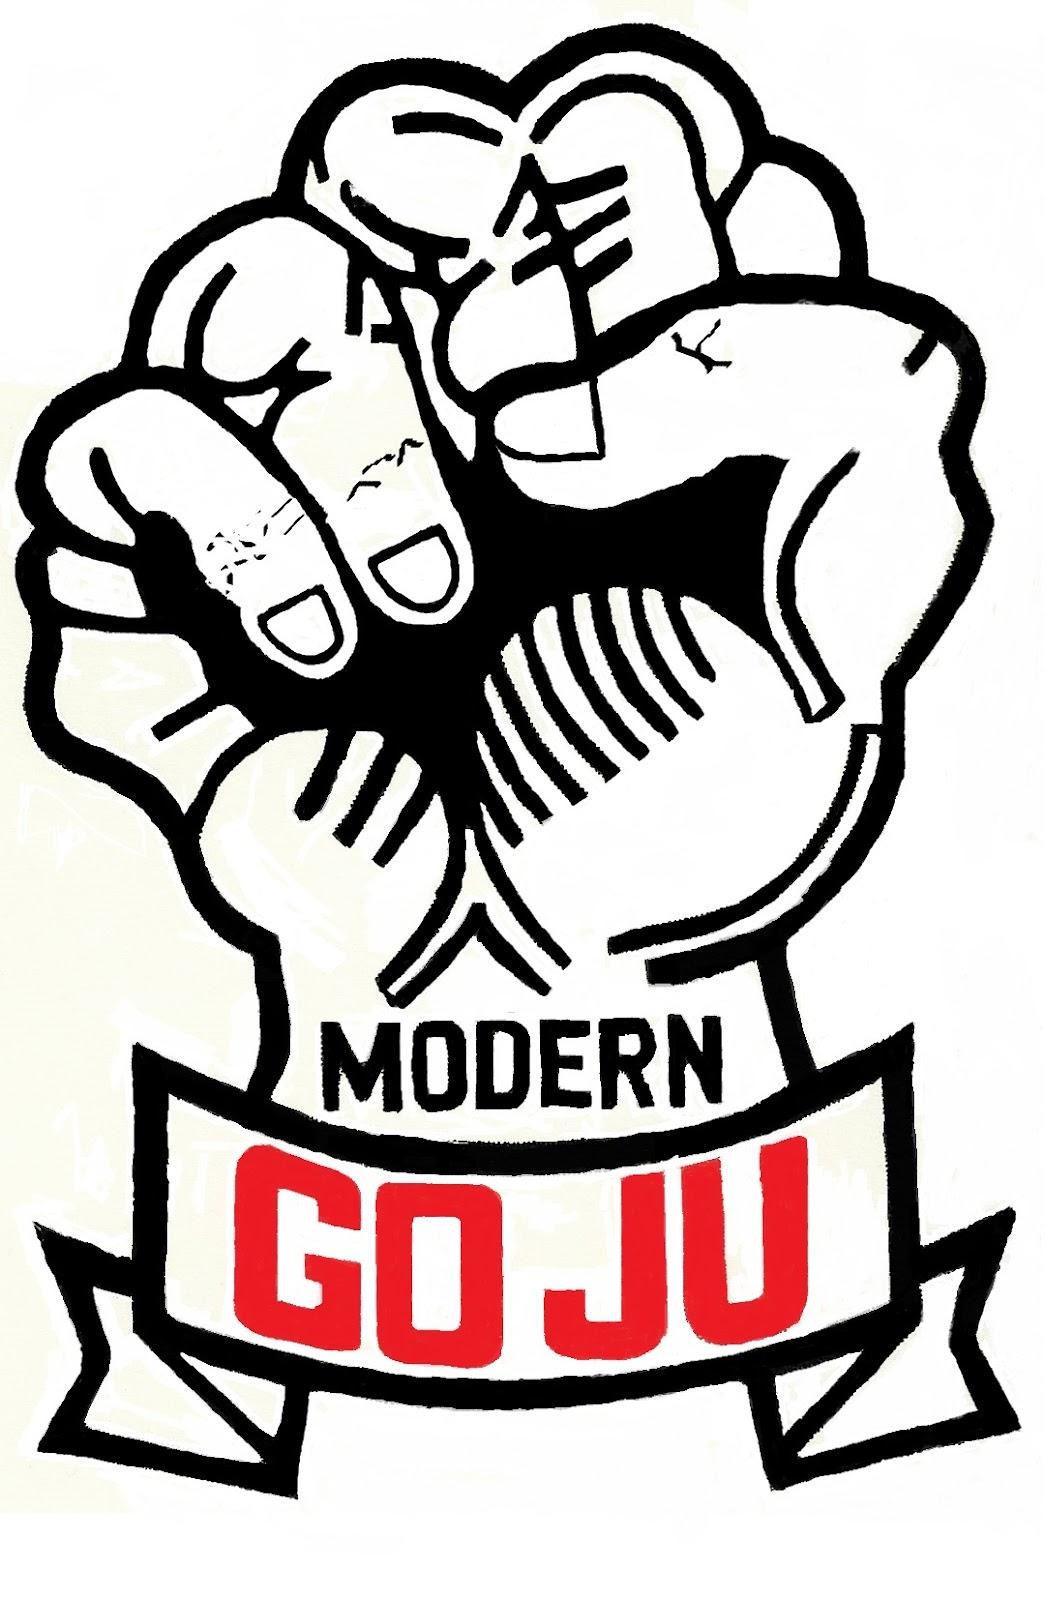 Modern Goju Fist.JPG